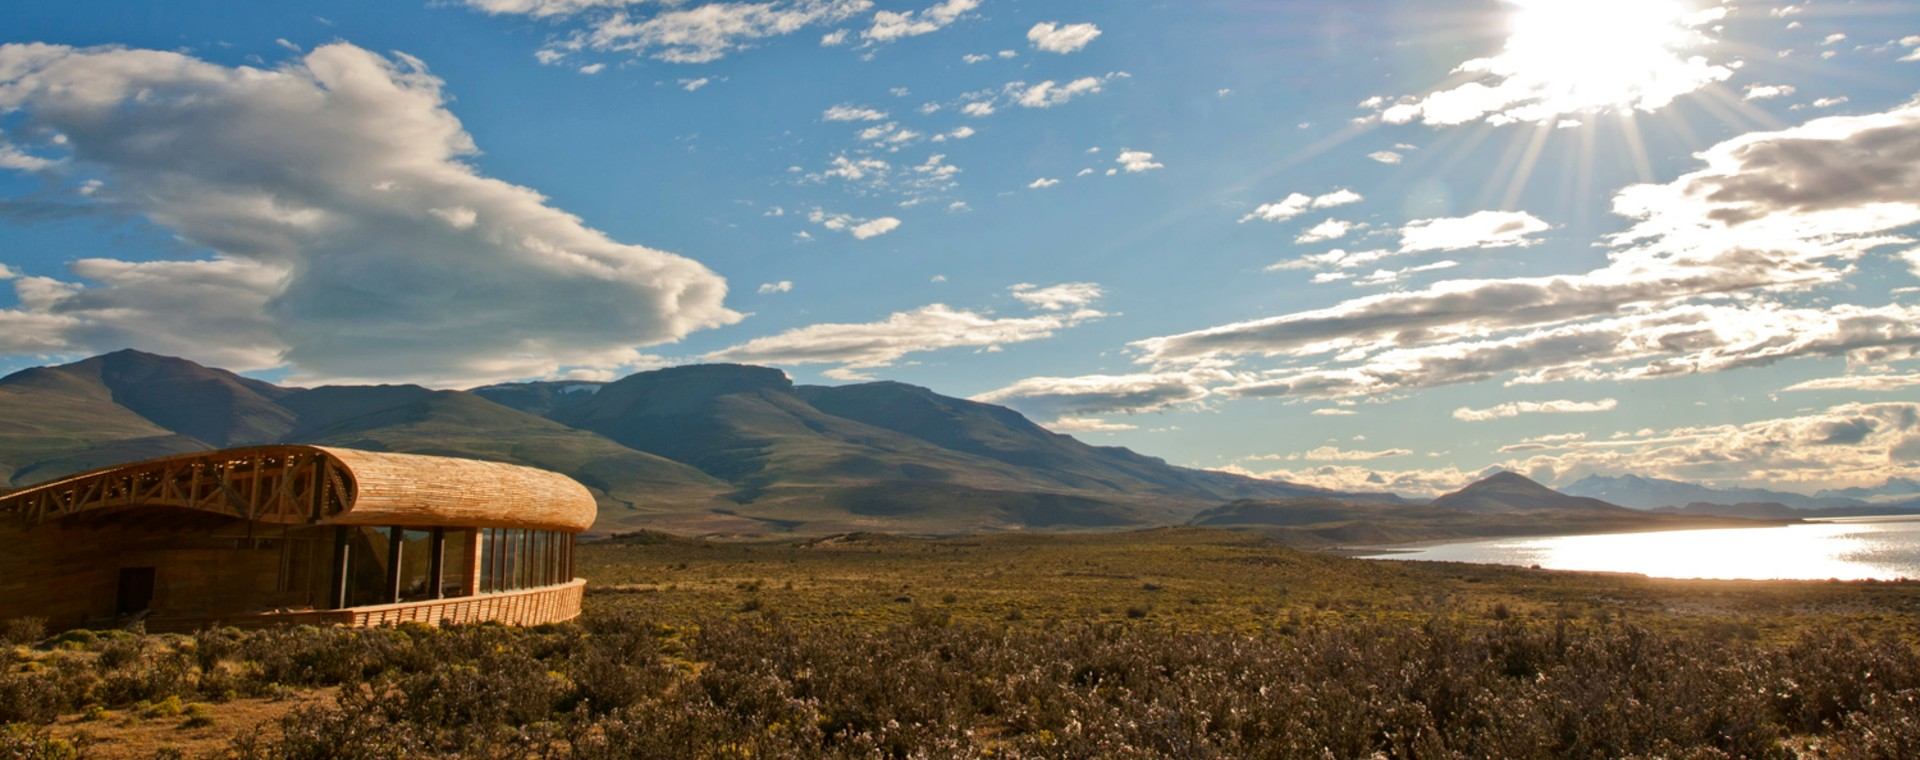 Tierra Patagonia, Chile | Plan South America